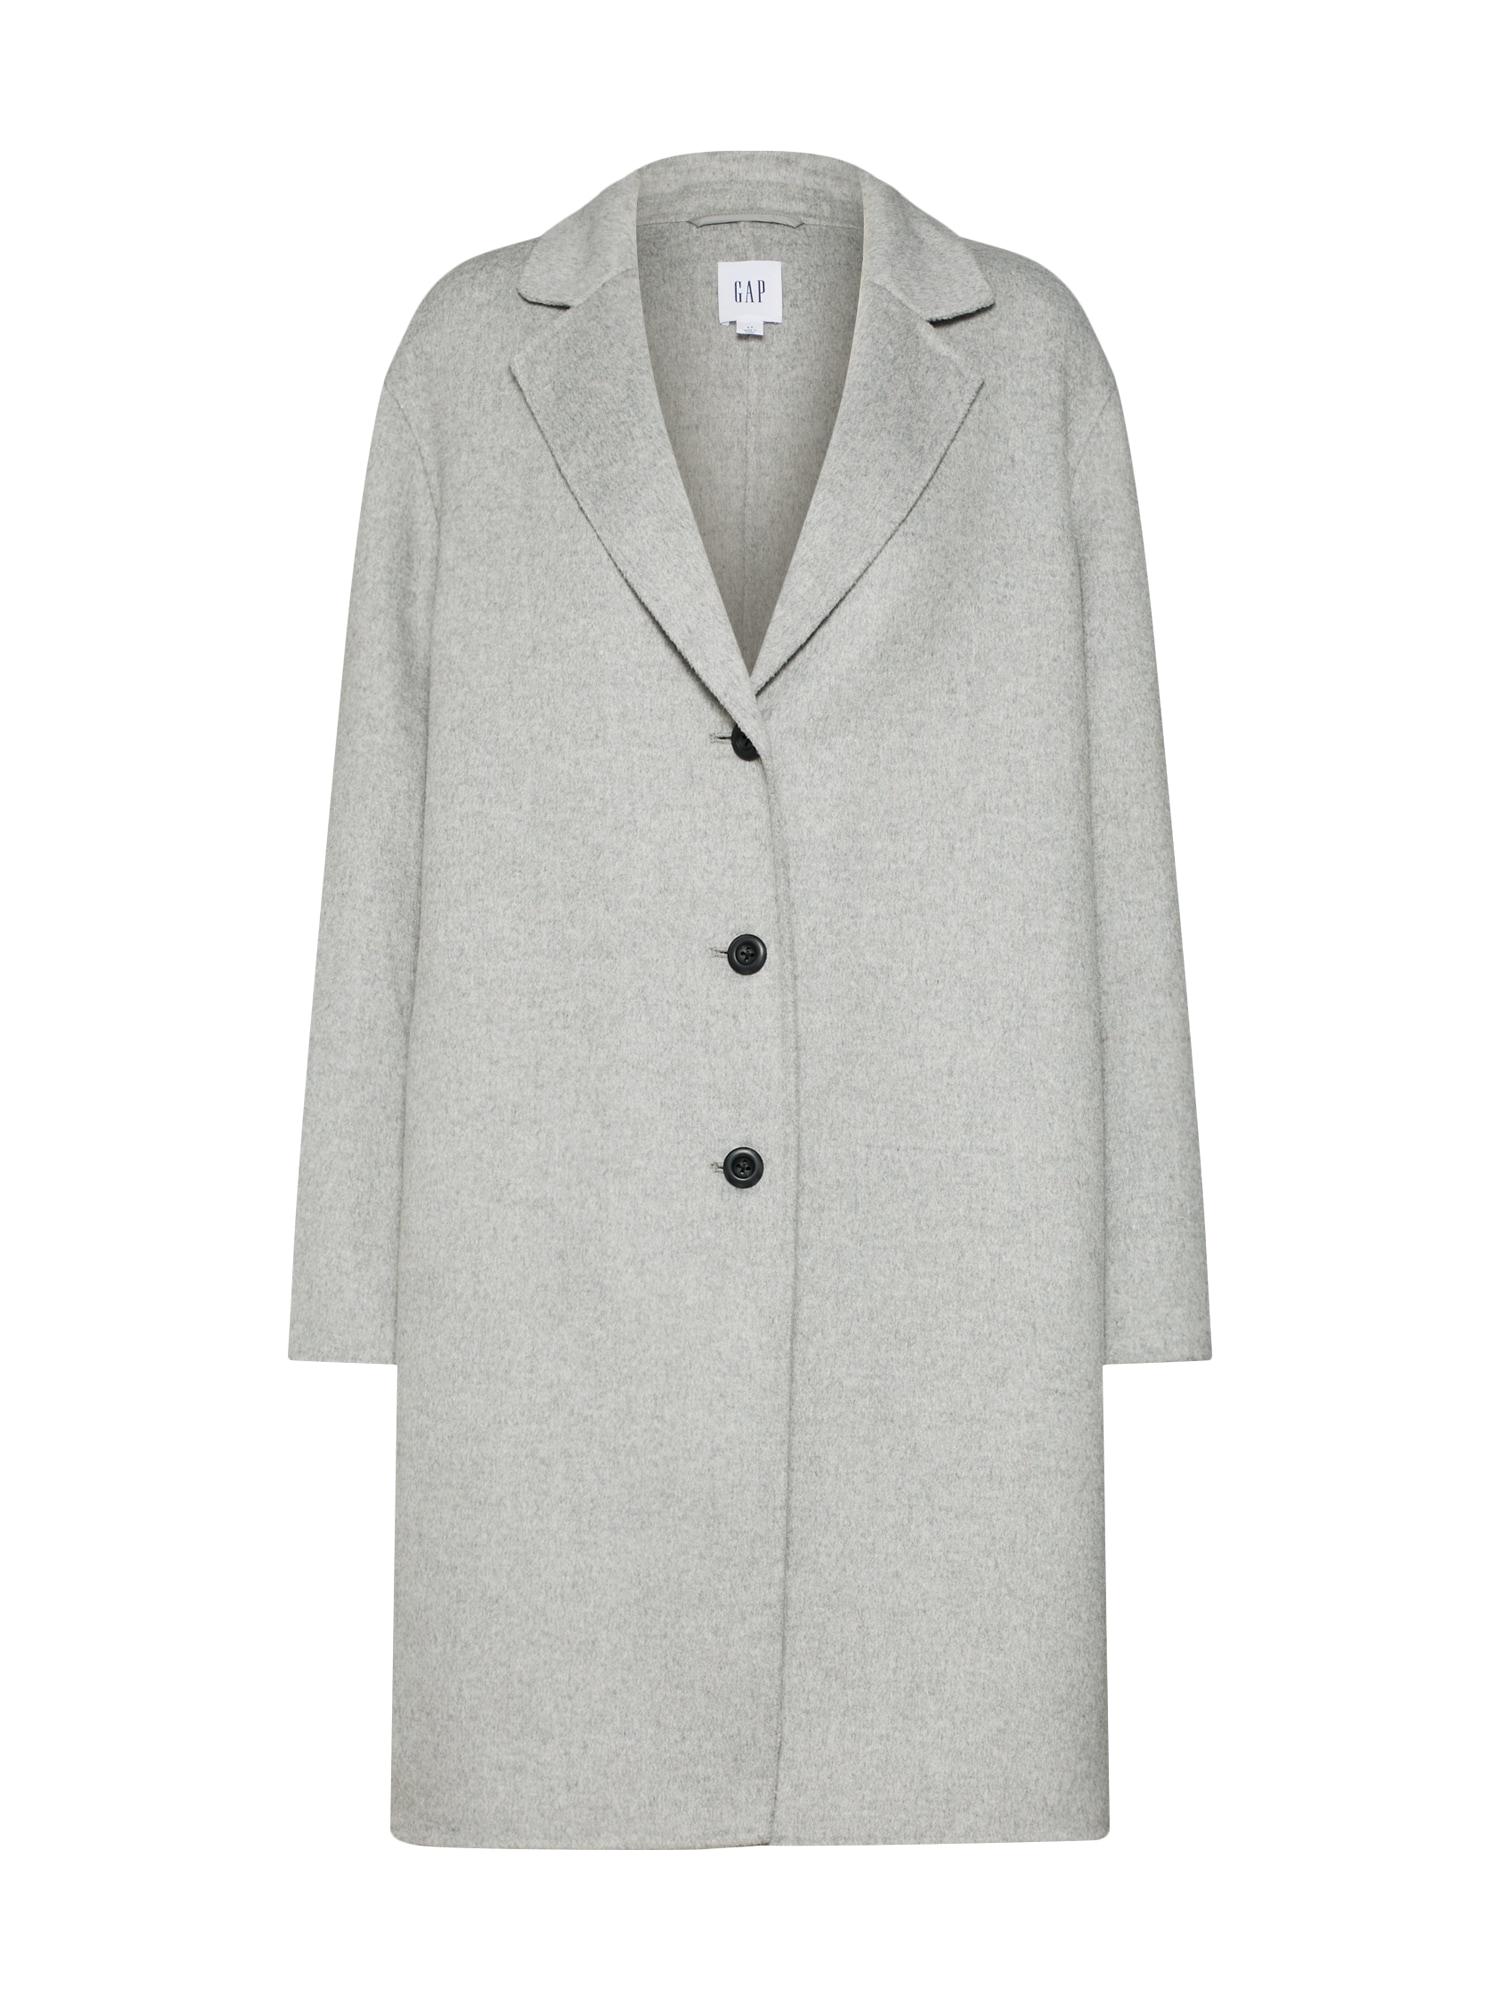 GAP Rudeninis-žieminis paltas margai pilka